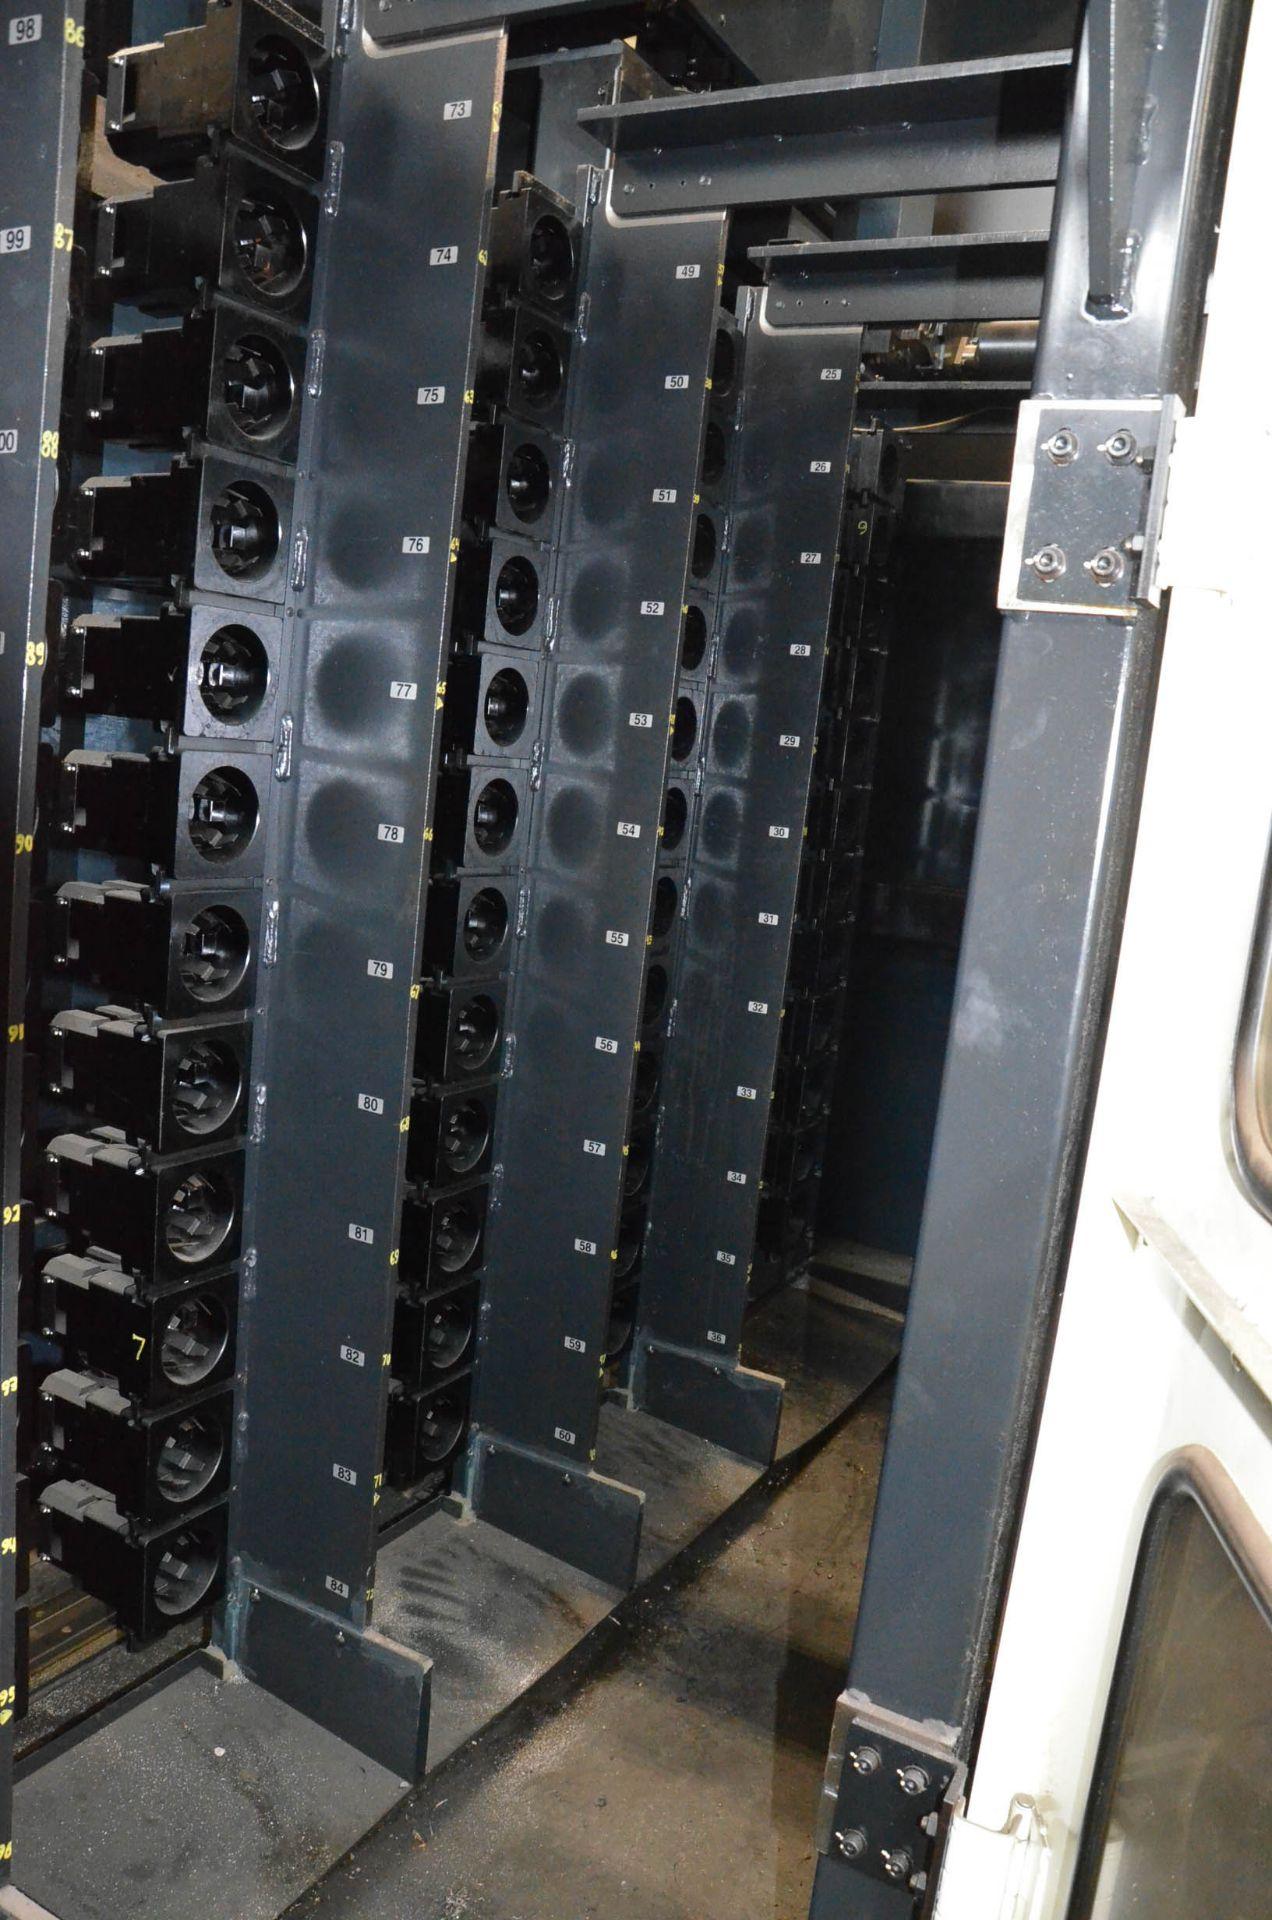 "MAKINO (2013) MCC2013 VG 6-AXIS CNC MACHINING CENTER WITH MAKINO PROFESSIONAL 5 CNC CONTROL, 59"" X - Image 11 of 11"